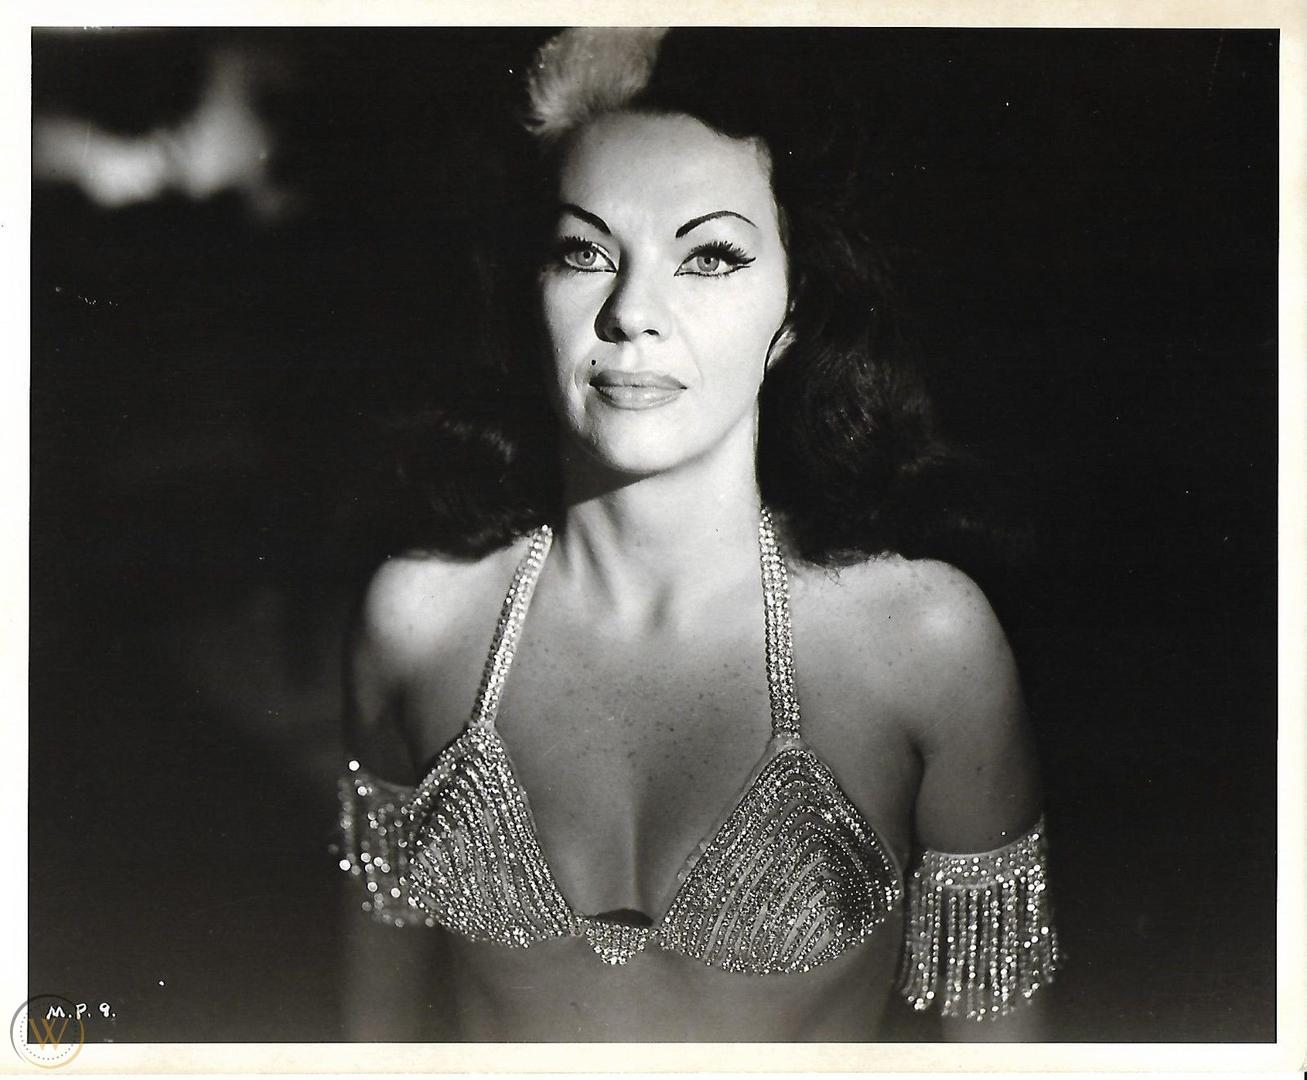 black and white photo of the actress tongolele